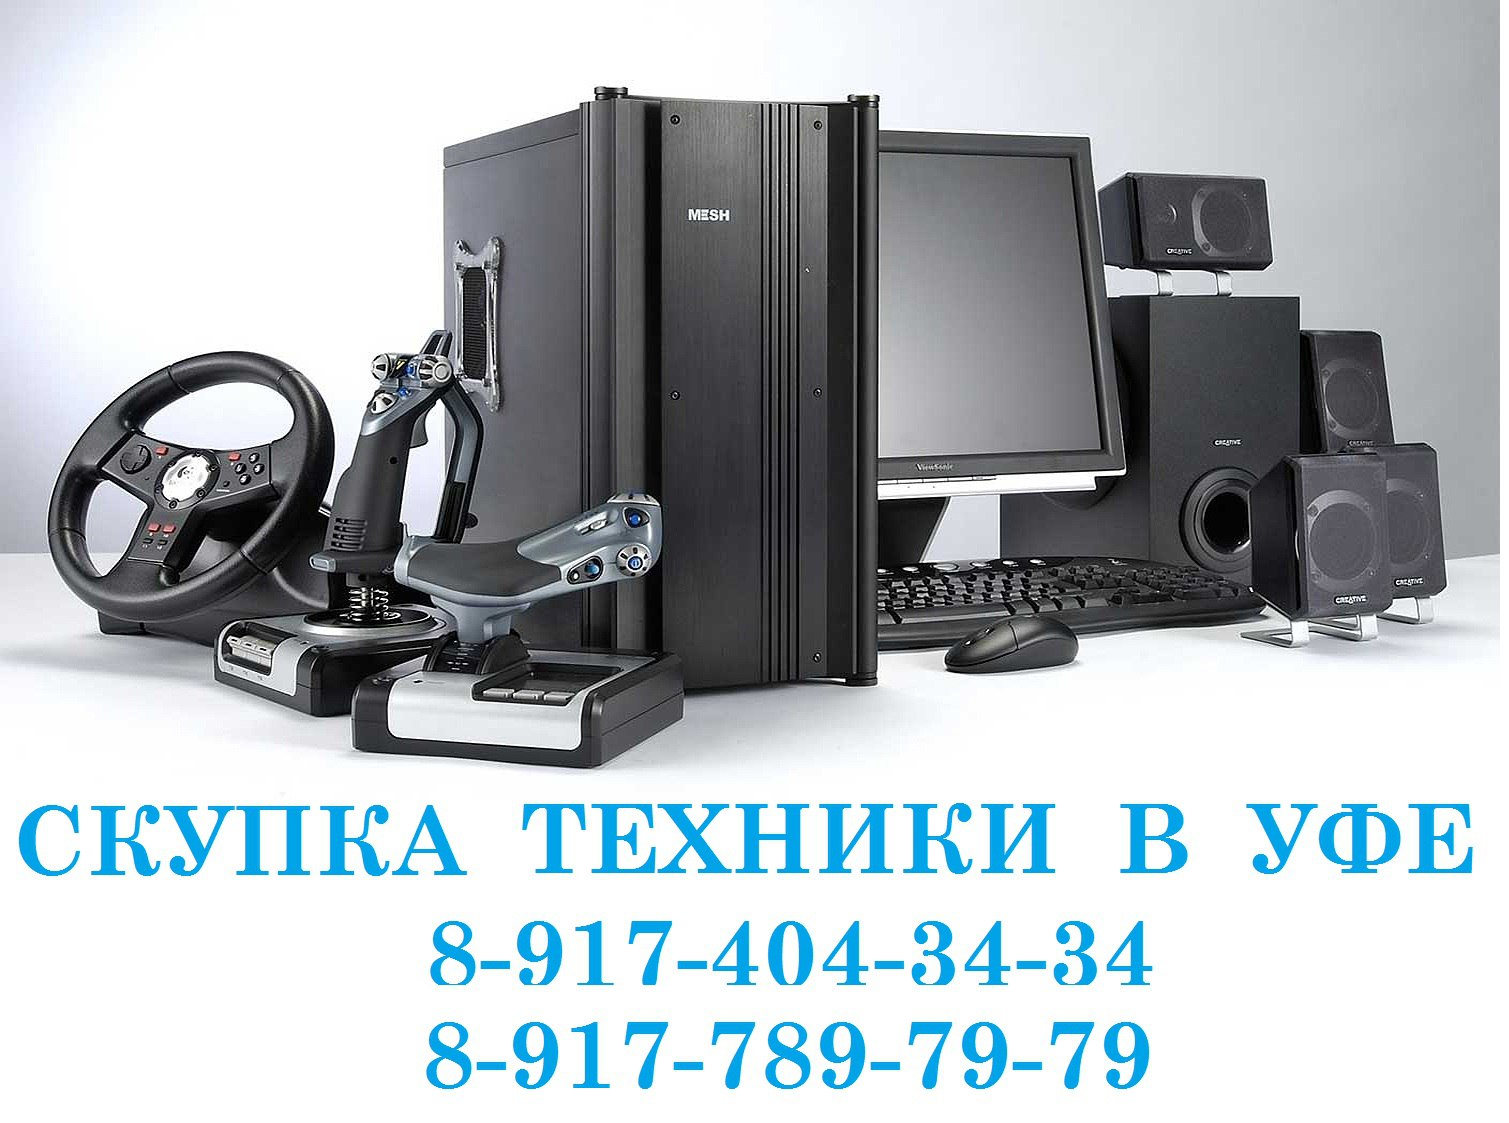 Скупка Видеокарт в Уфе http://www.uco.su/catalog/skupka-kompyuterov-v-ufe-